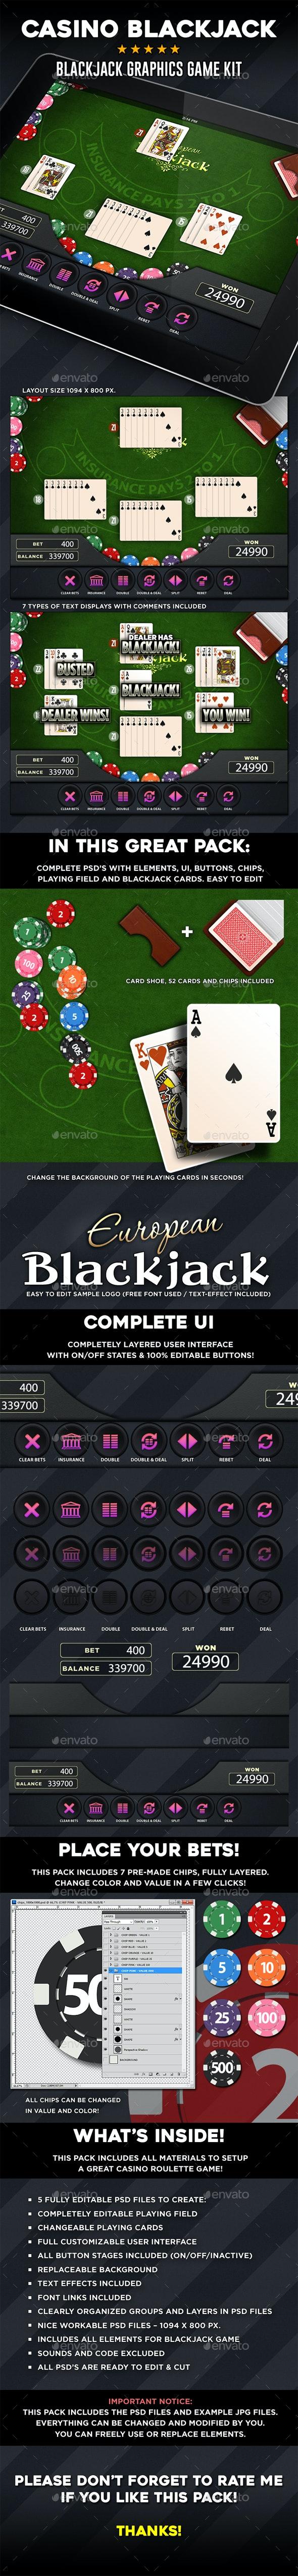 Casino Blackjack Graphics Game Kit - Game Kits Game Assets